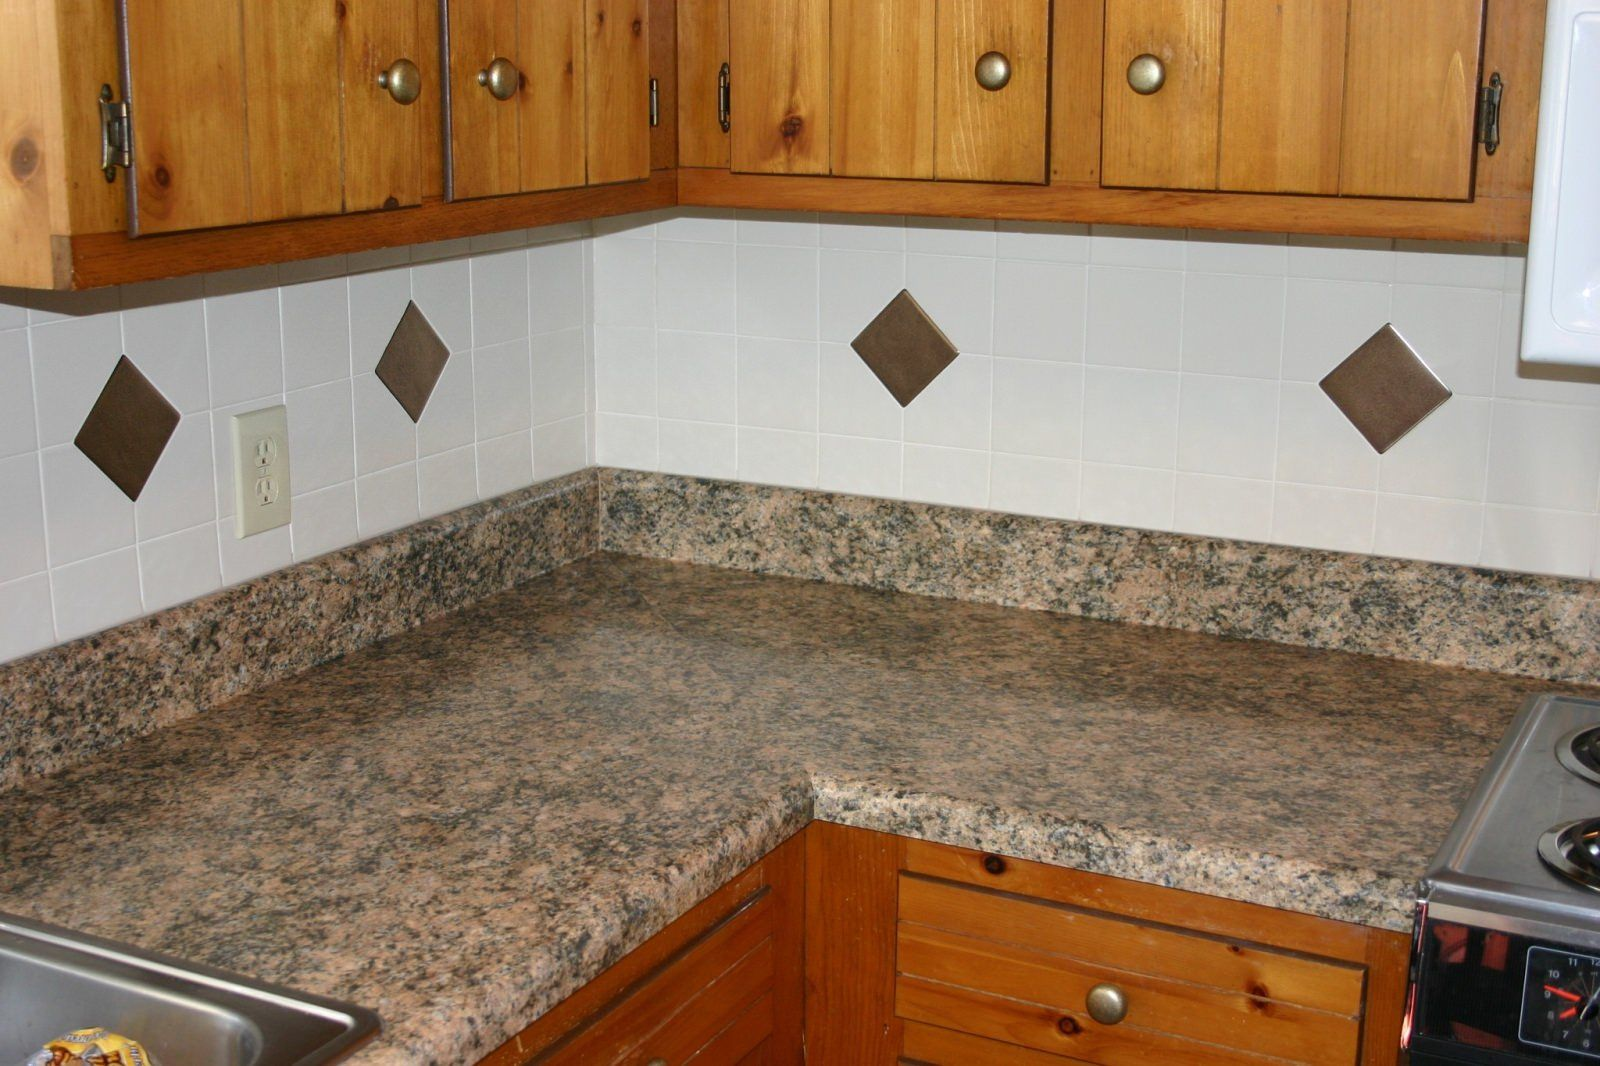 77+ Care Of Granite Countertops Maintenance   Kitchen Island Countertop  Ideas Check More At Http